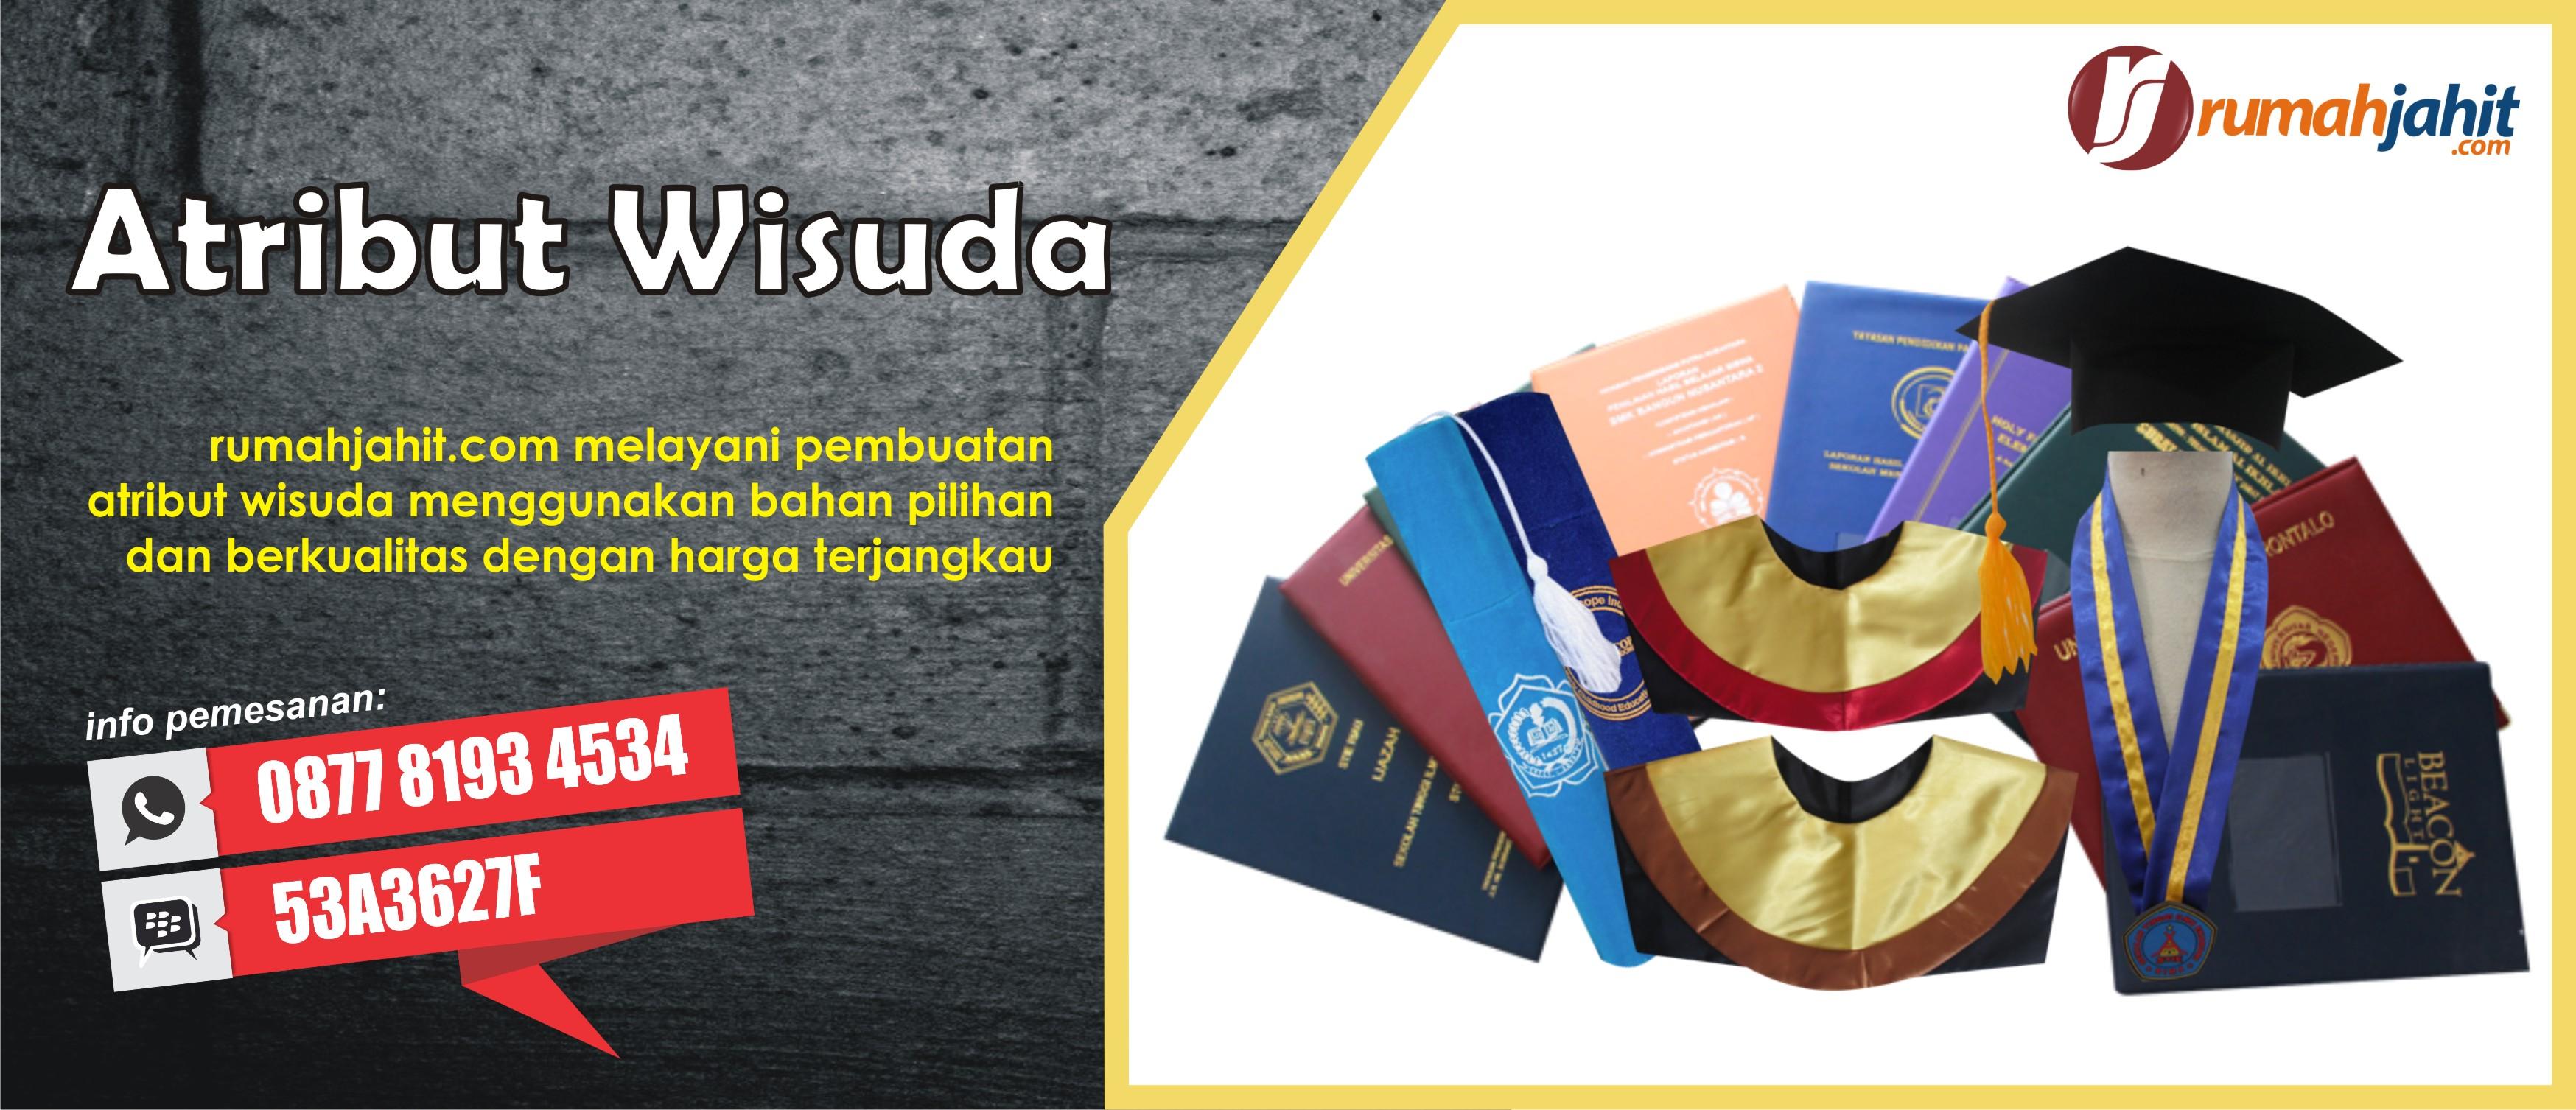 Design banner wisuda - Atribut Toga Wisuda Banner Atribut